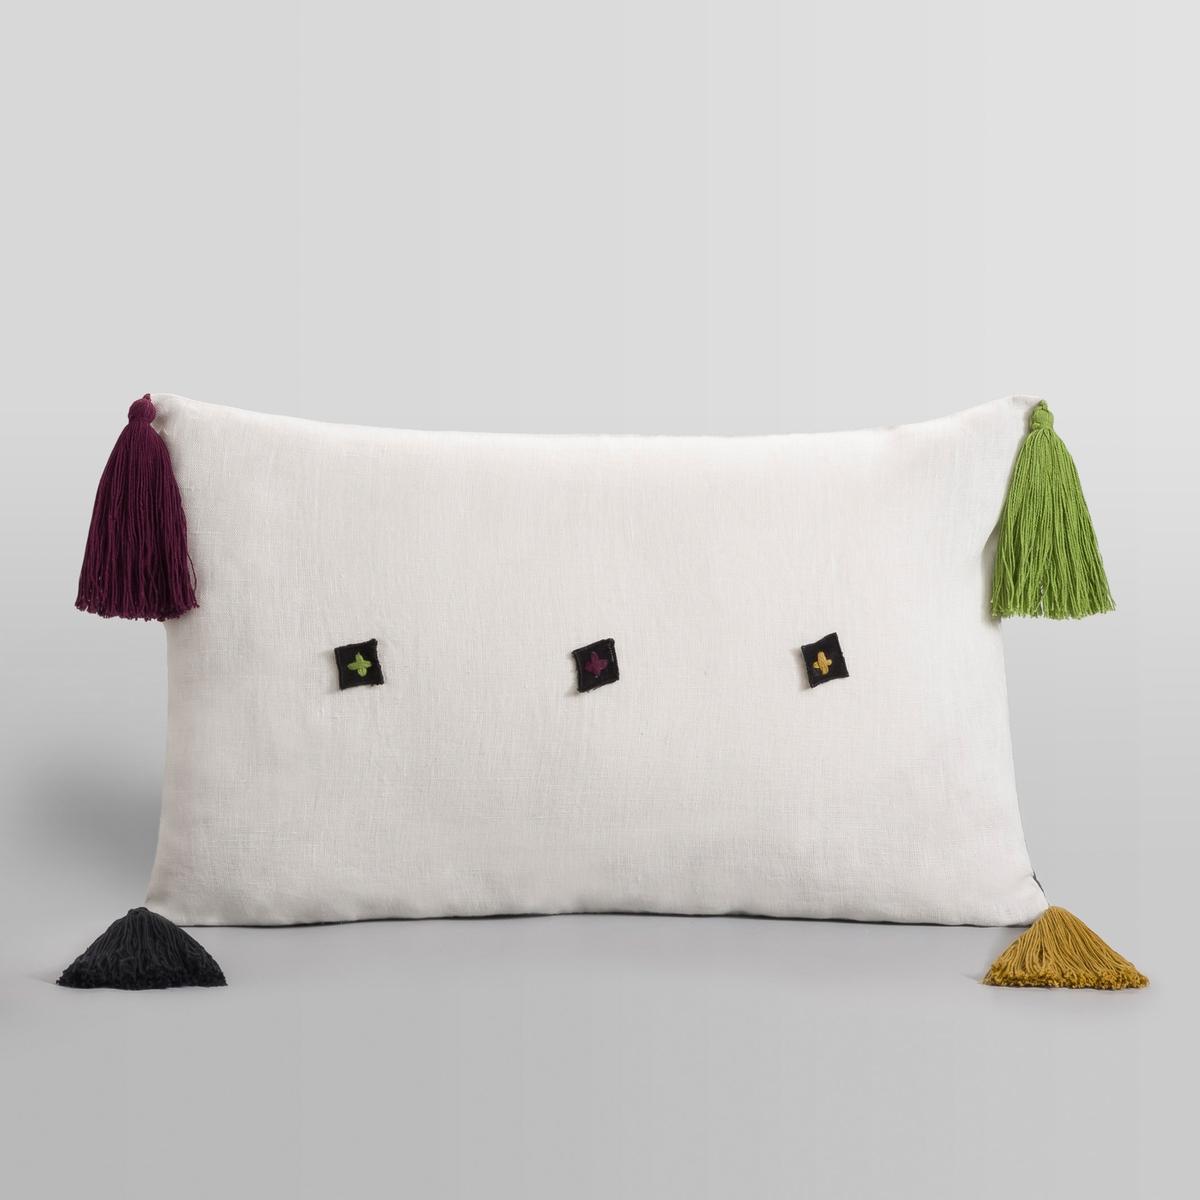 Чехол для подушки, Madoo design V. Барковски